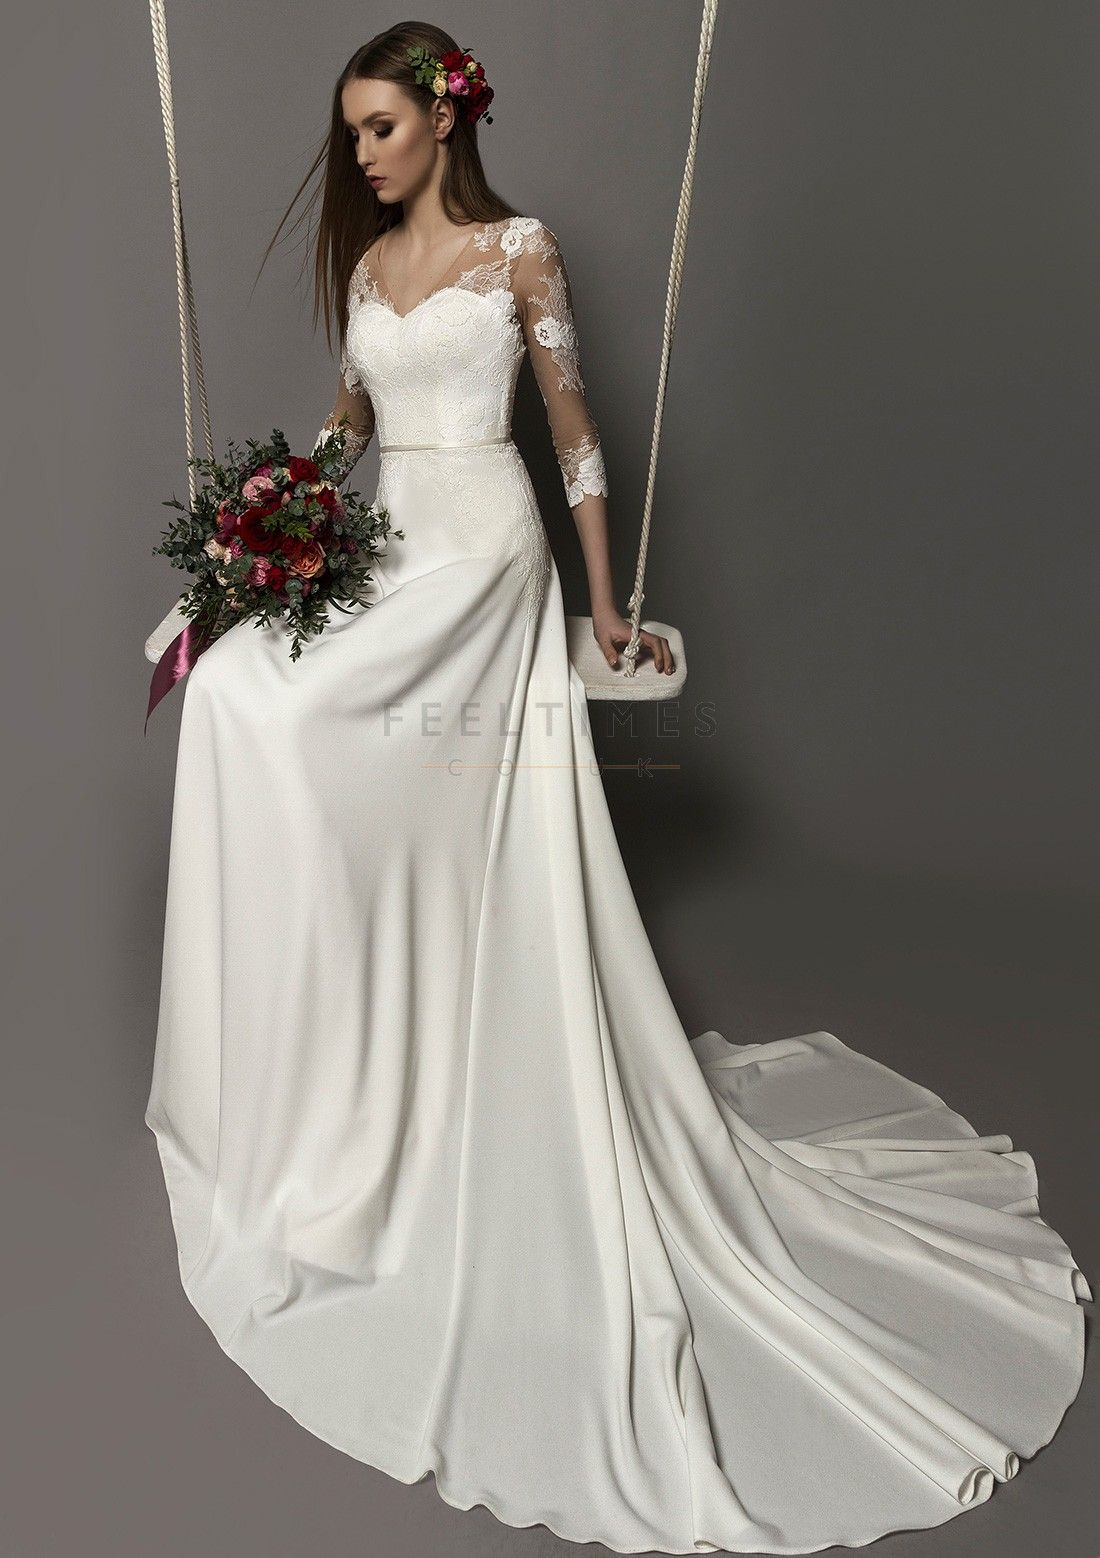 Aline/Princess Satin Wedding Dress 3/4 Sleeve Chapel